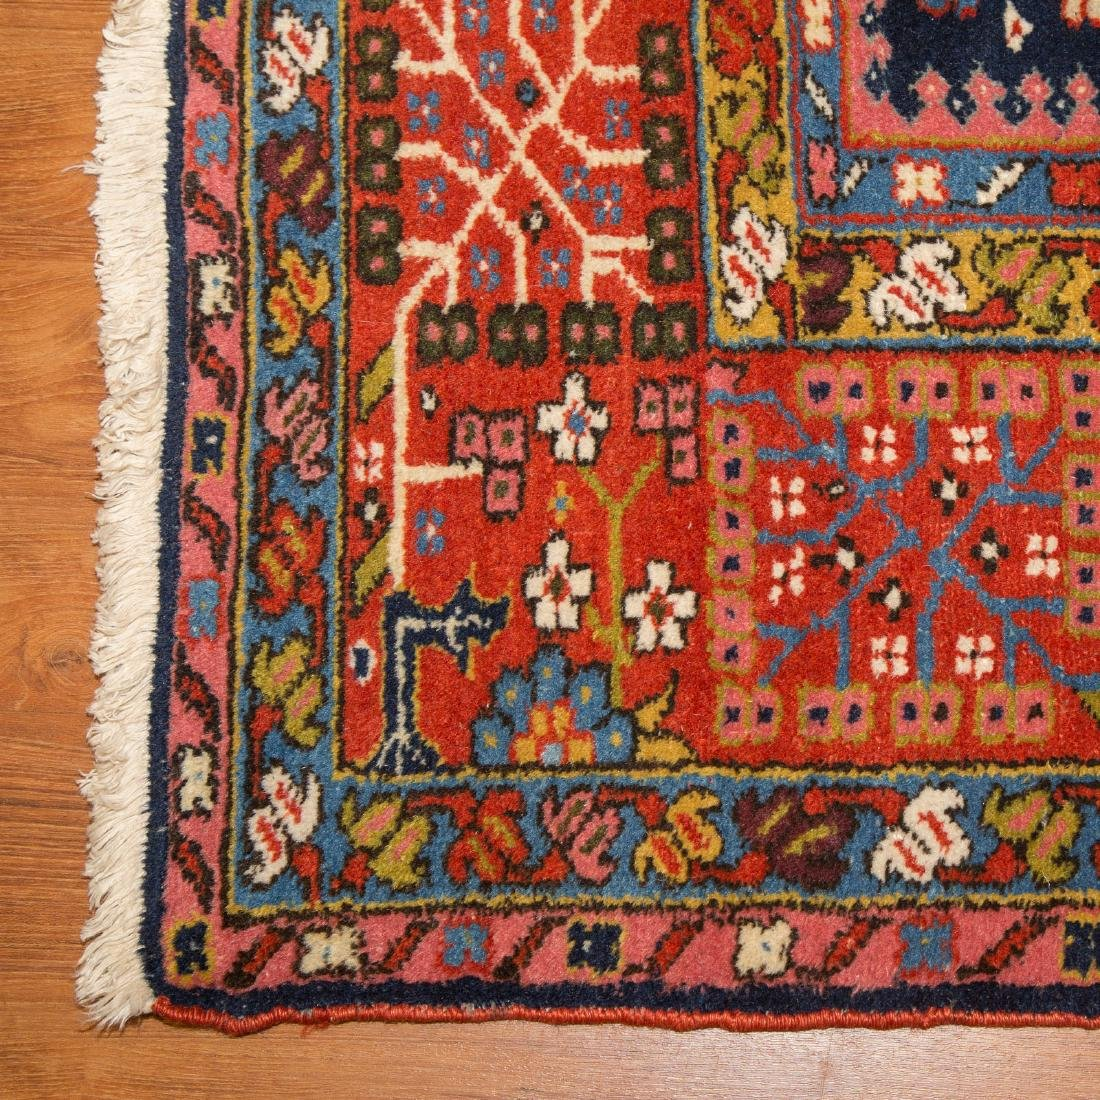 Antique Karaja Herez rug, approx. 8.5 x 10.1 - 2